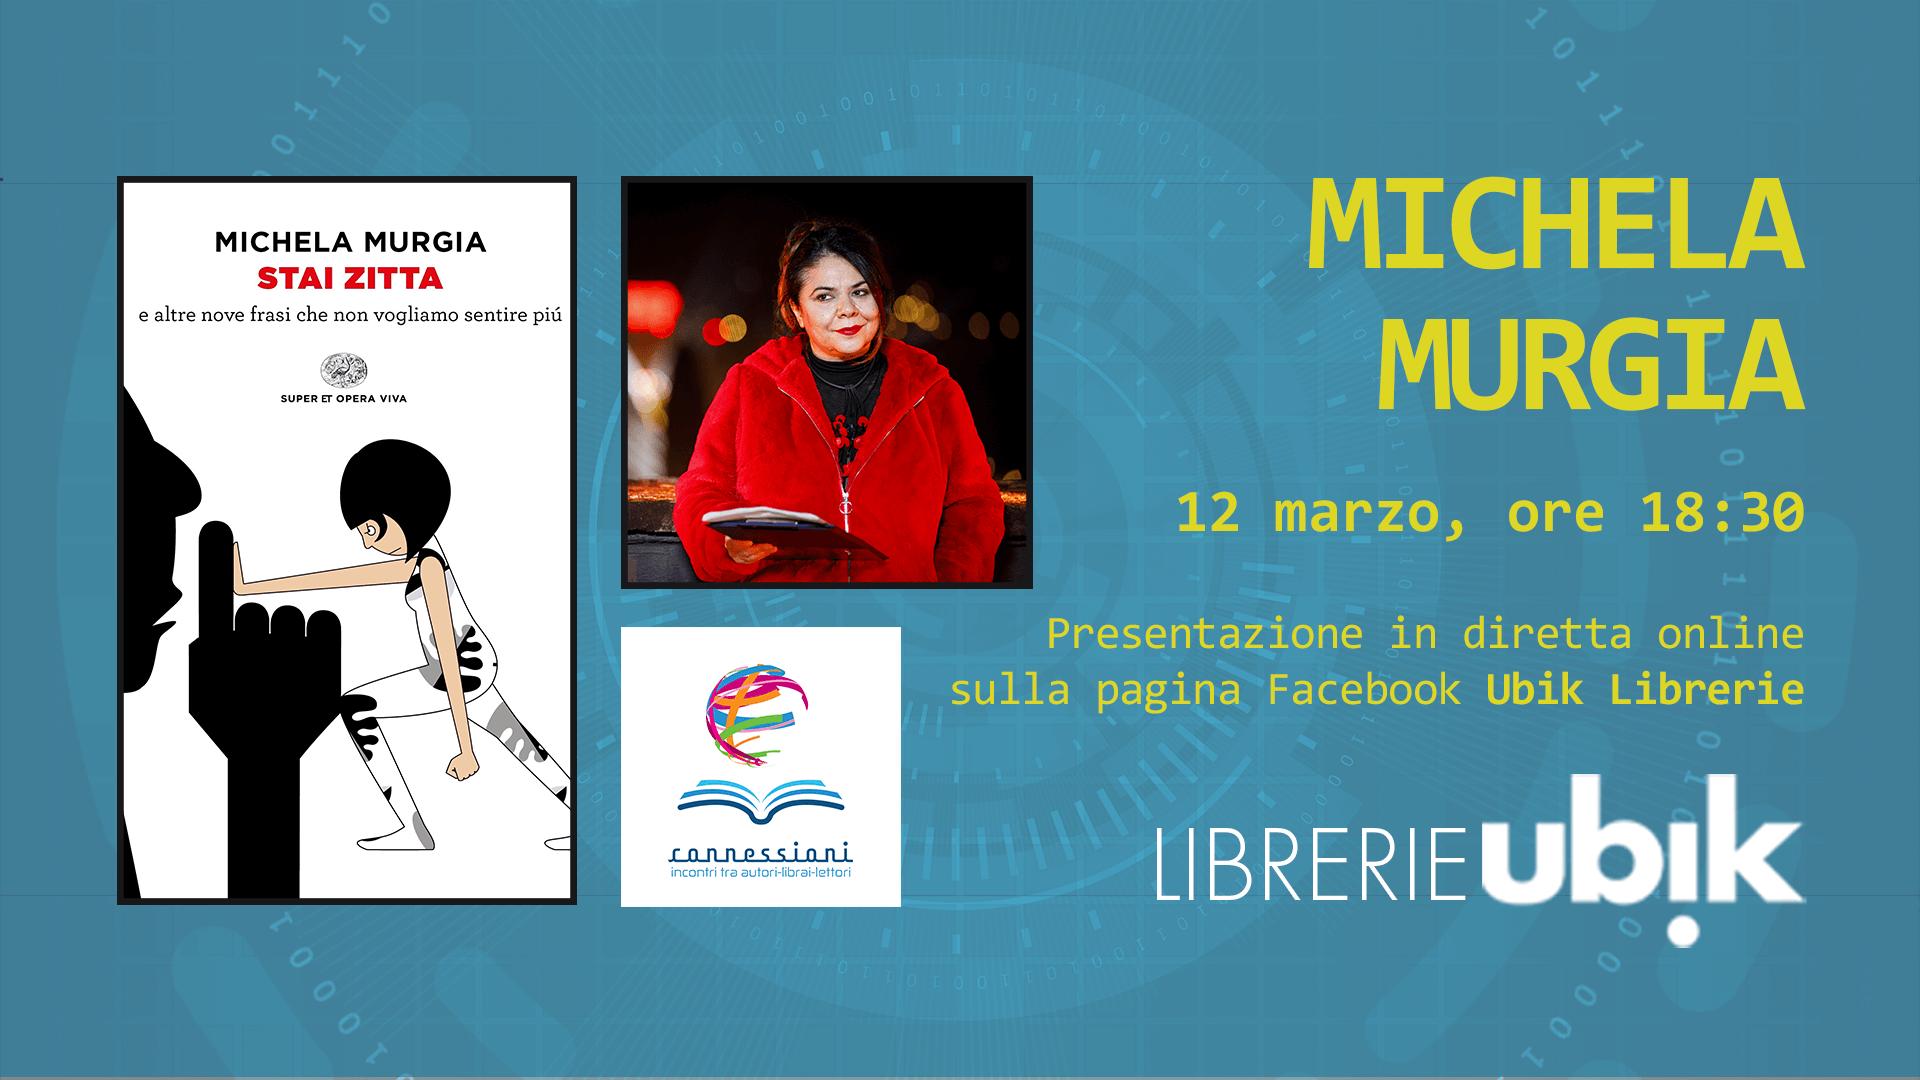 MICHELA MURGIA presenta in diretta online